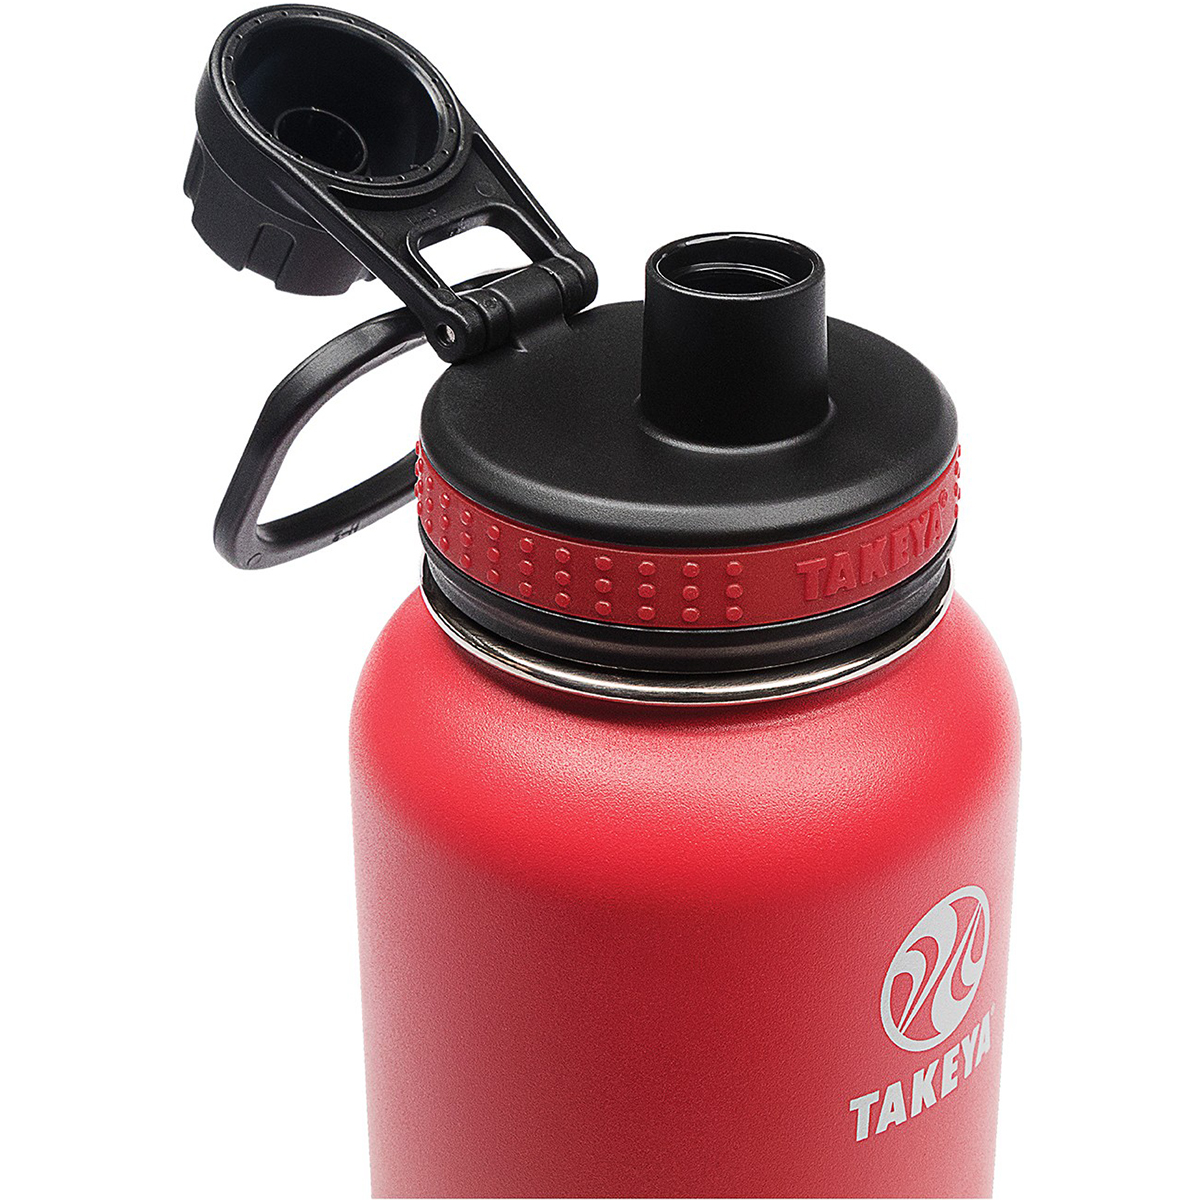 Takeya-Originals-32-oz-Insulated-Stainless-Steel-Water-Bottle thumbnail 17